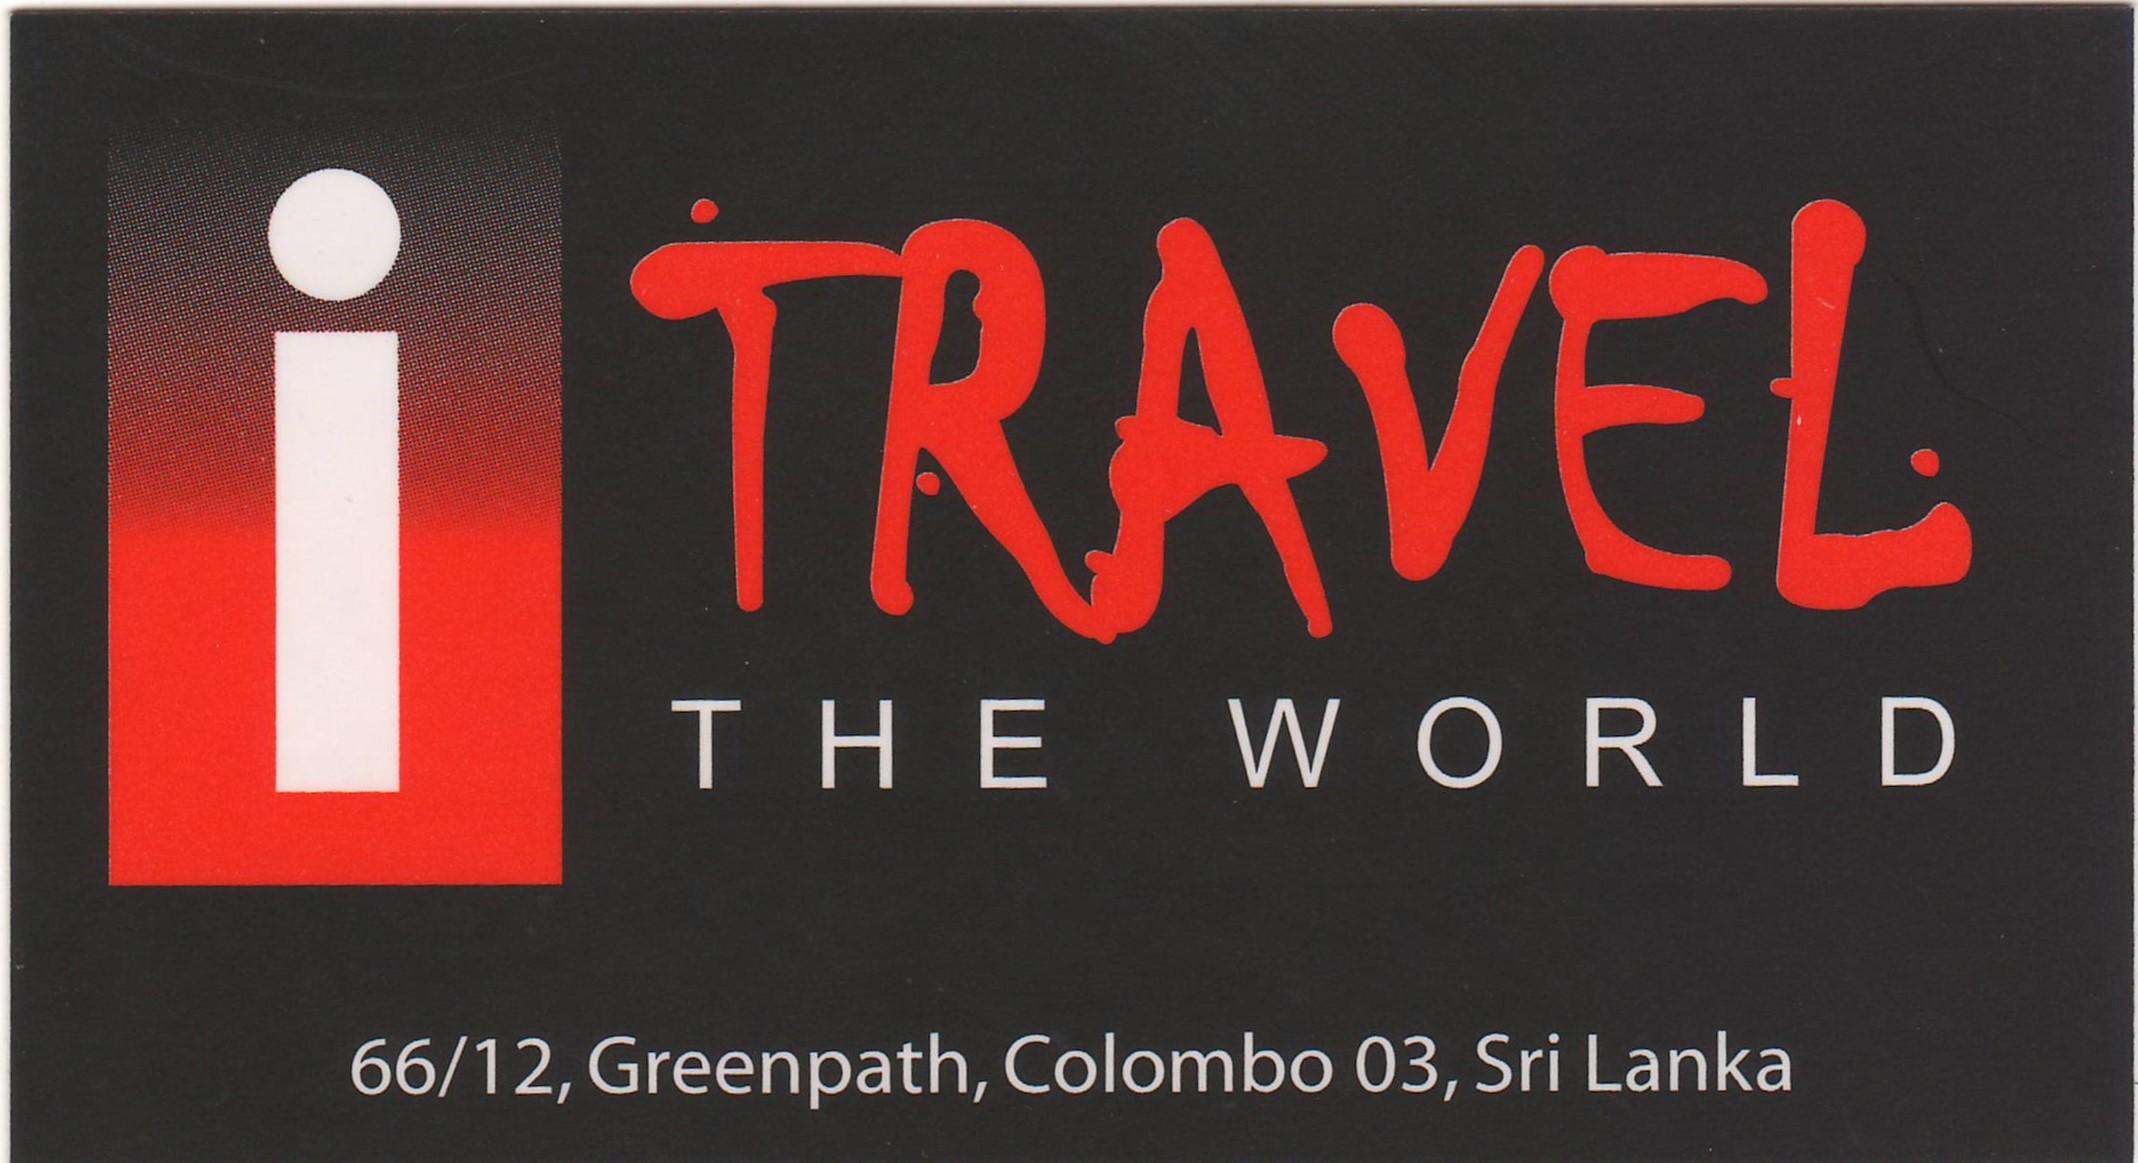 ITravel Pvt Ltd